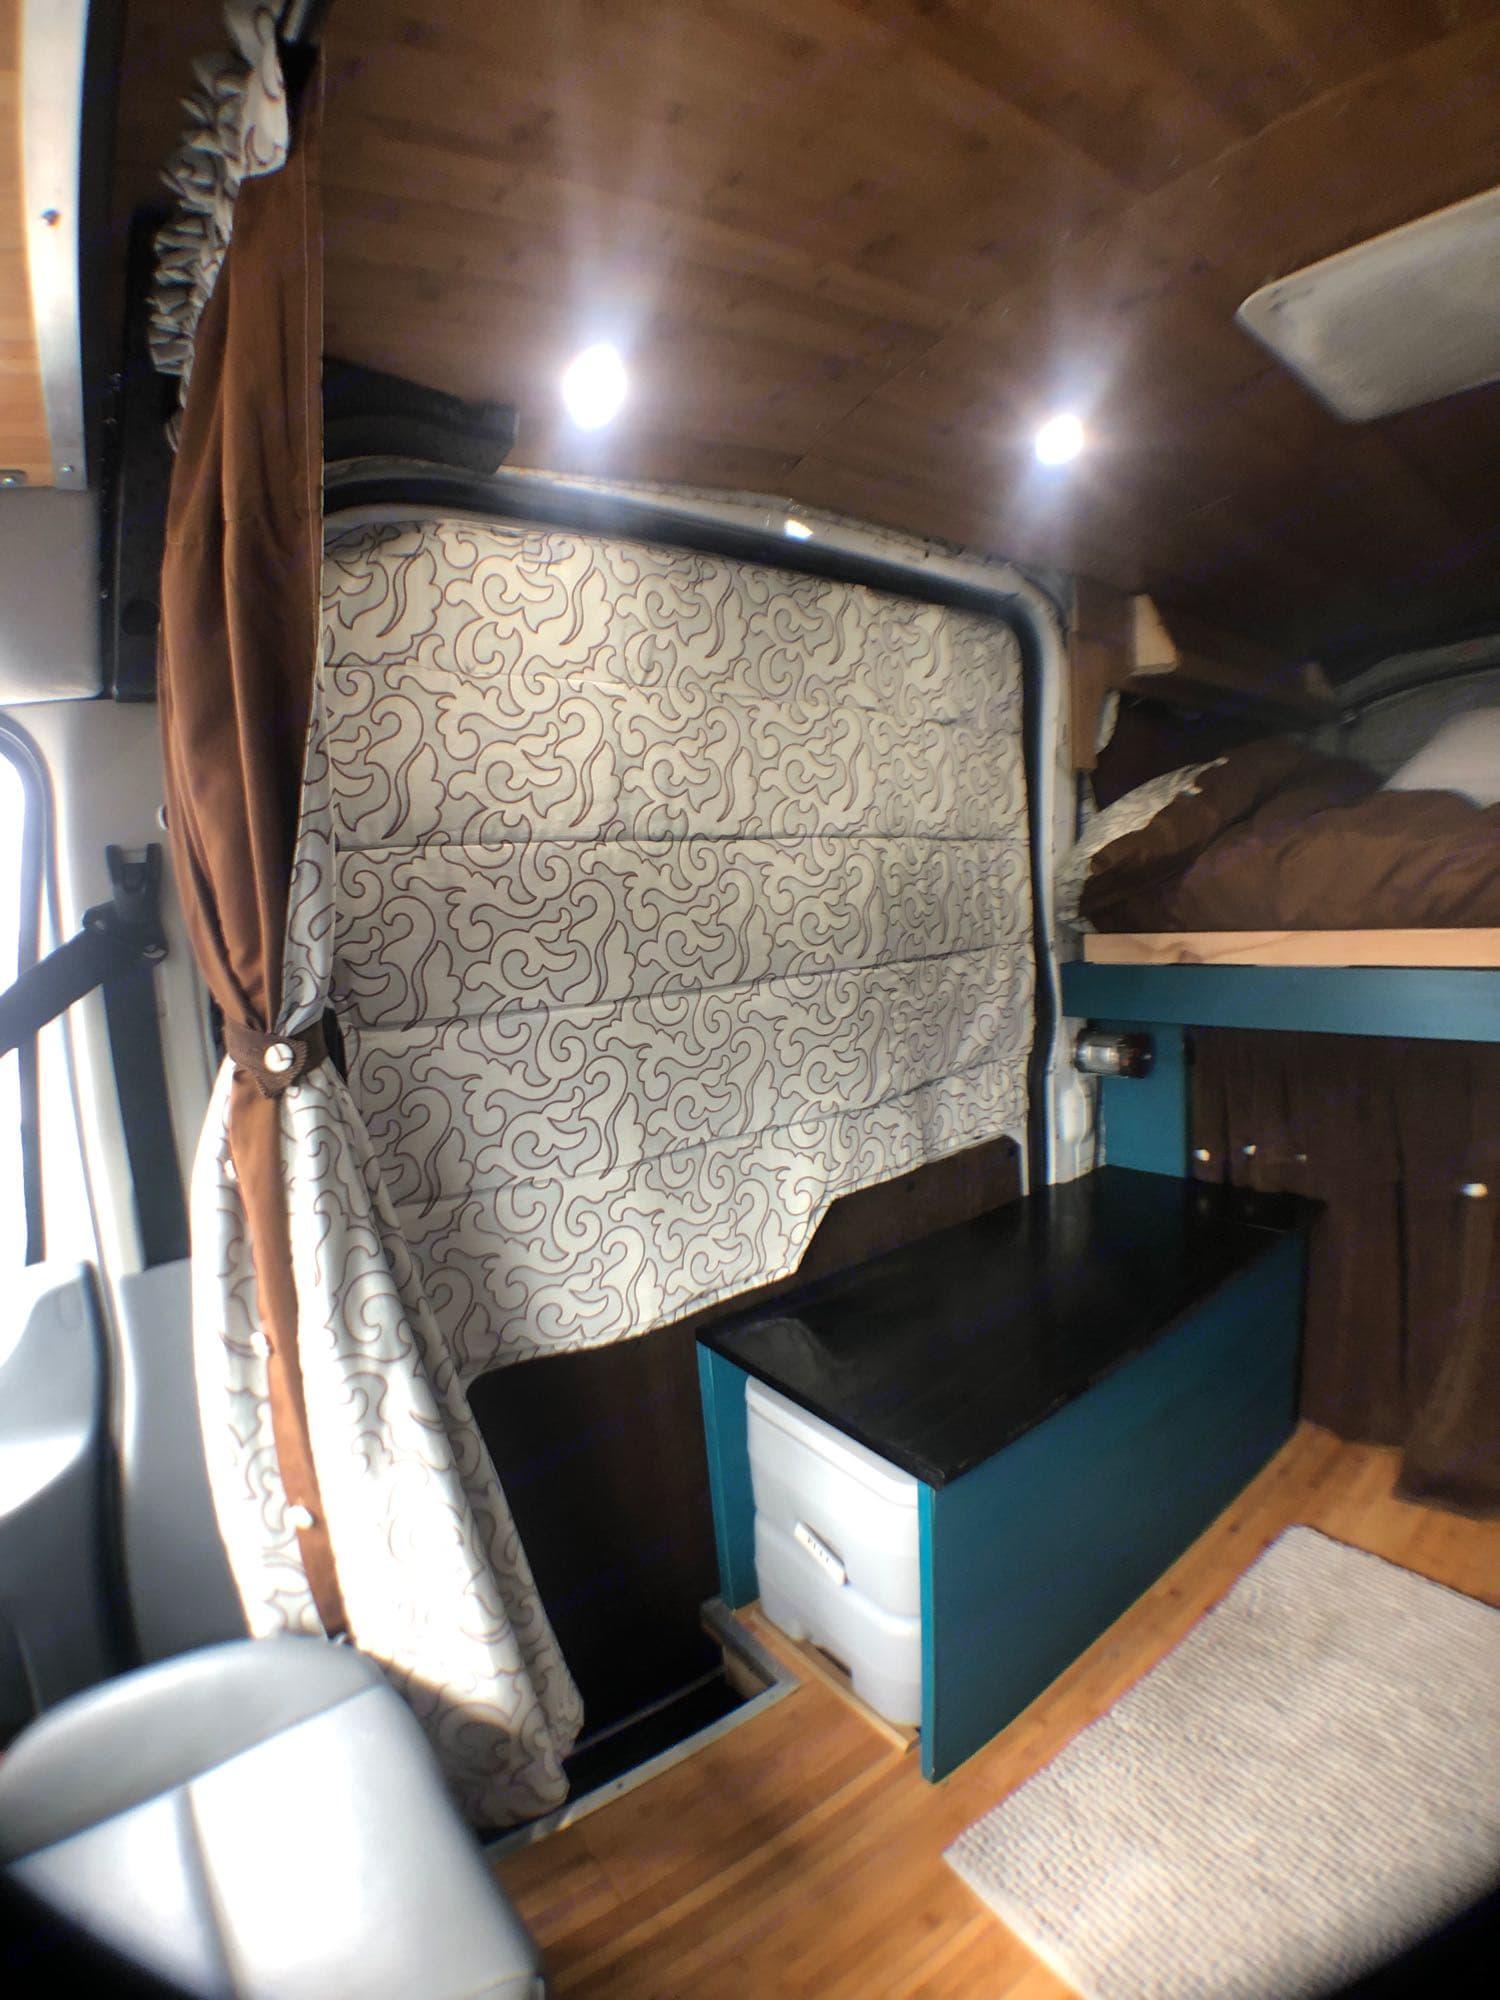 custom window coverings. Ford Transit 2015